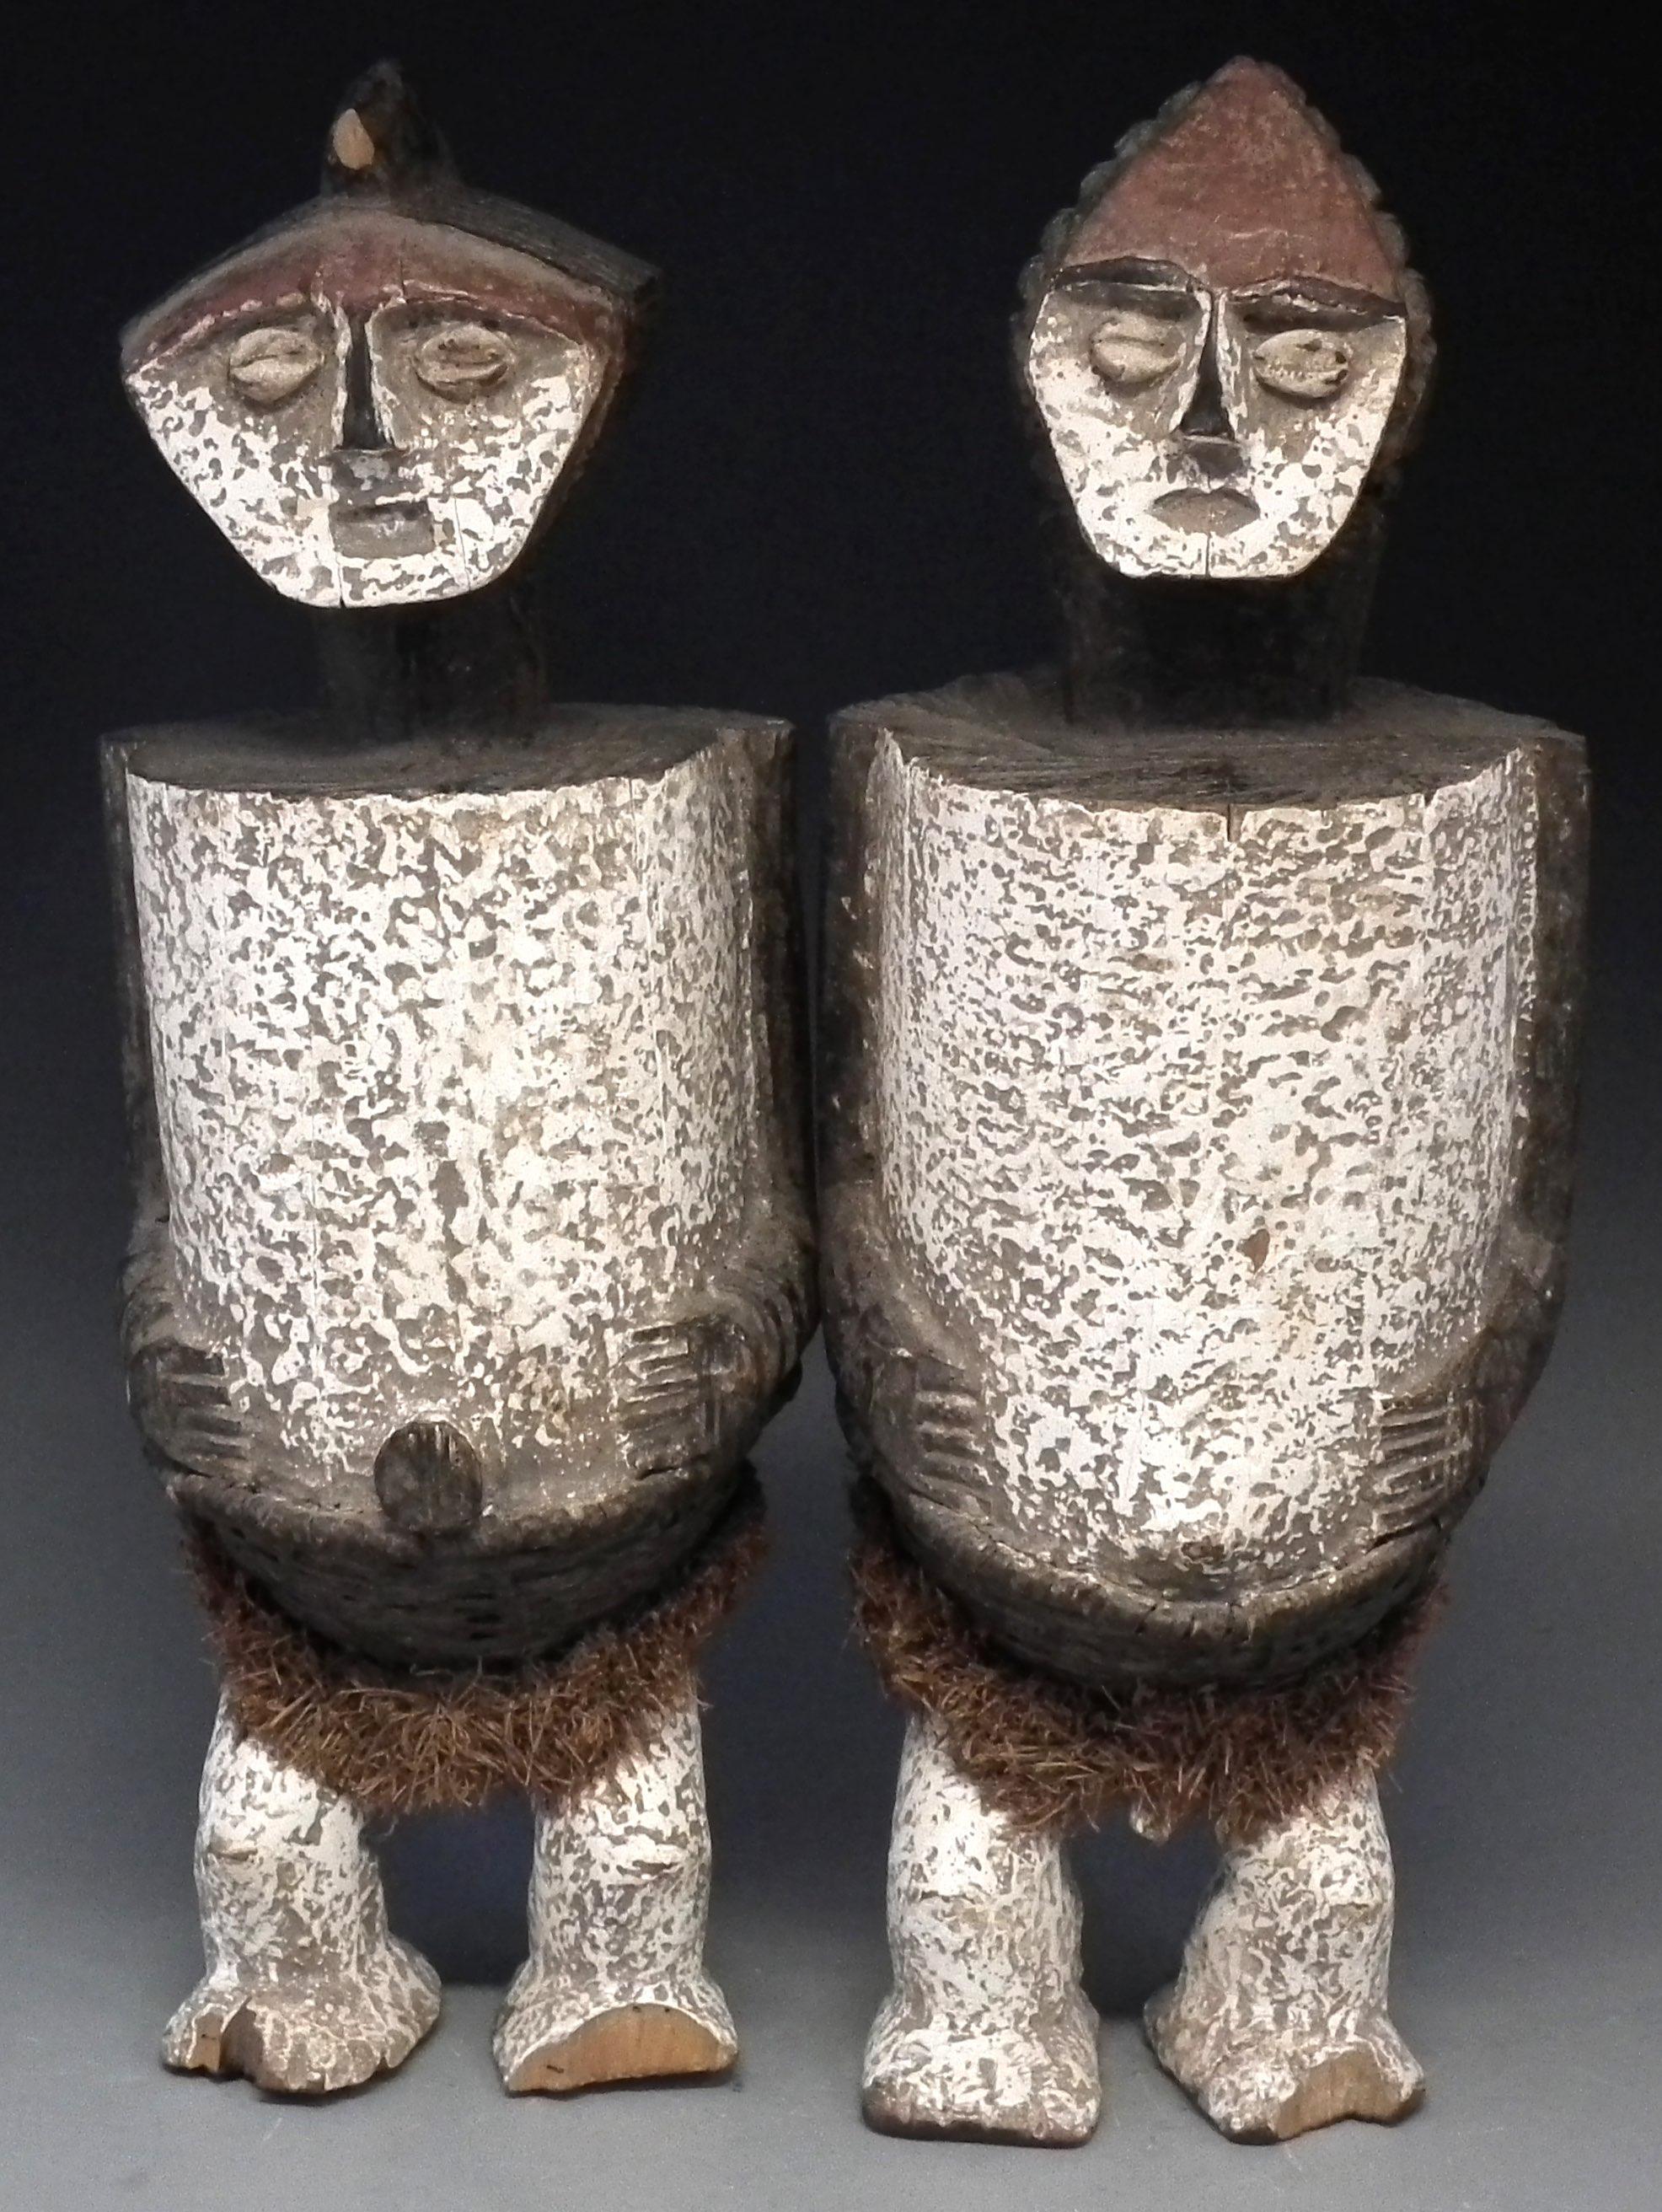 Lot169 Ambete reliquary figures £100-150